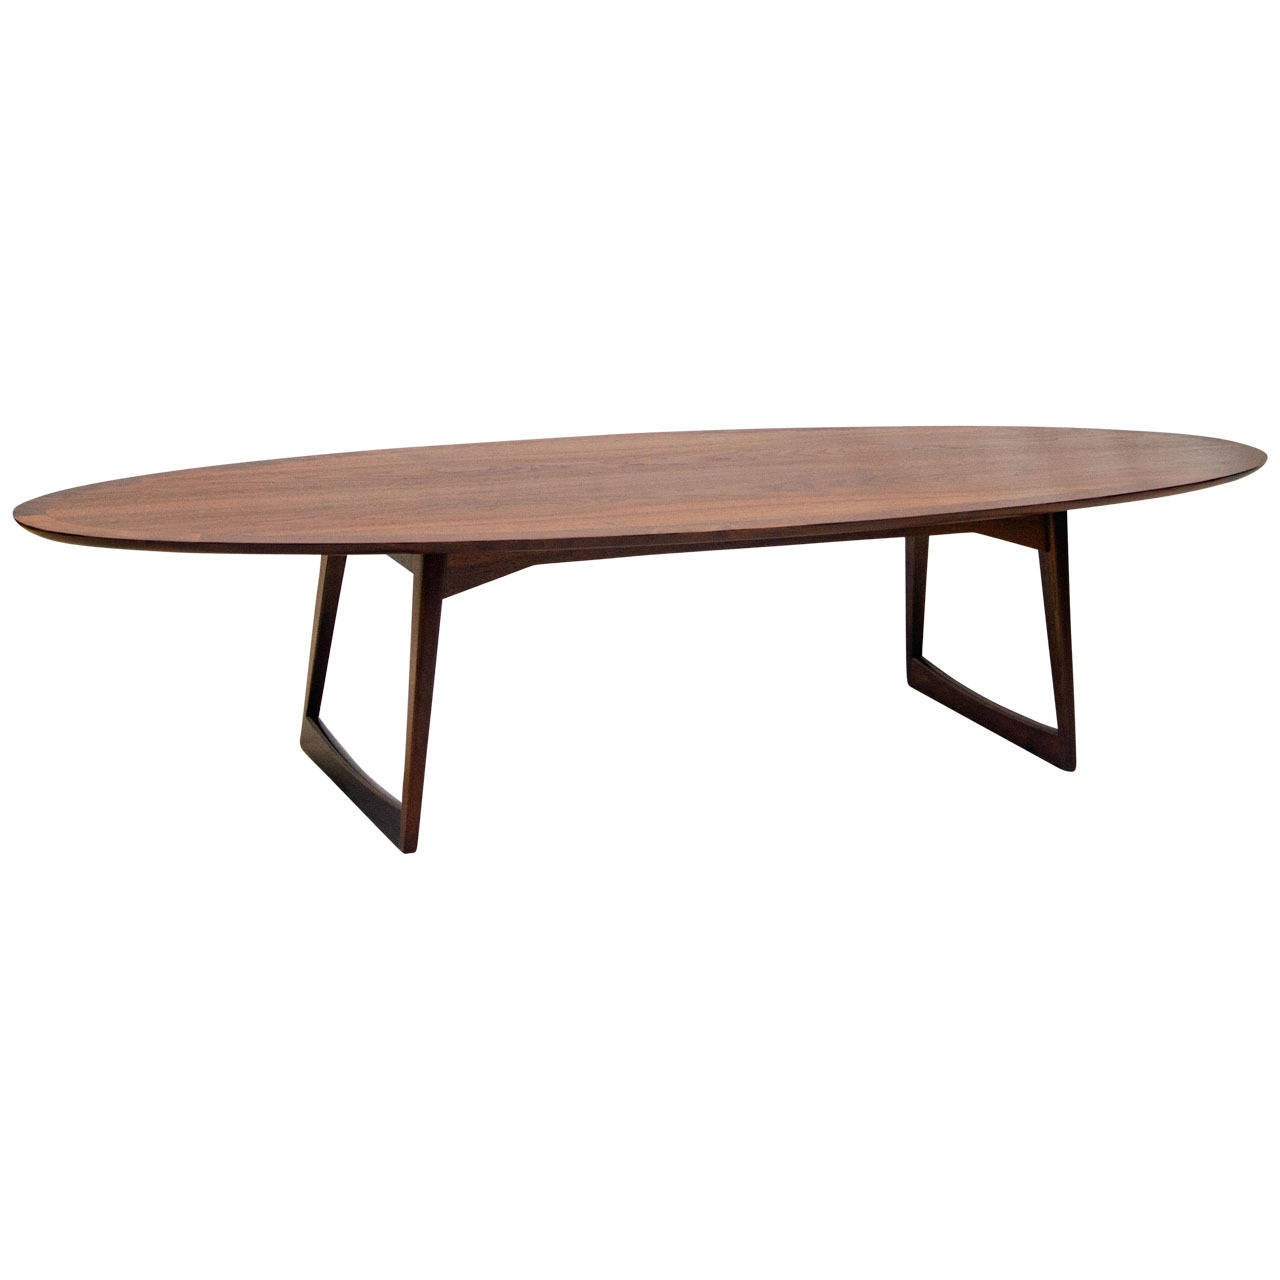 Vintage 71 Mid Century Modern Lane Danish Style Surfboard: Mid-Century Walnut Surfboard Coffee Table, MM Moreddi At